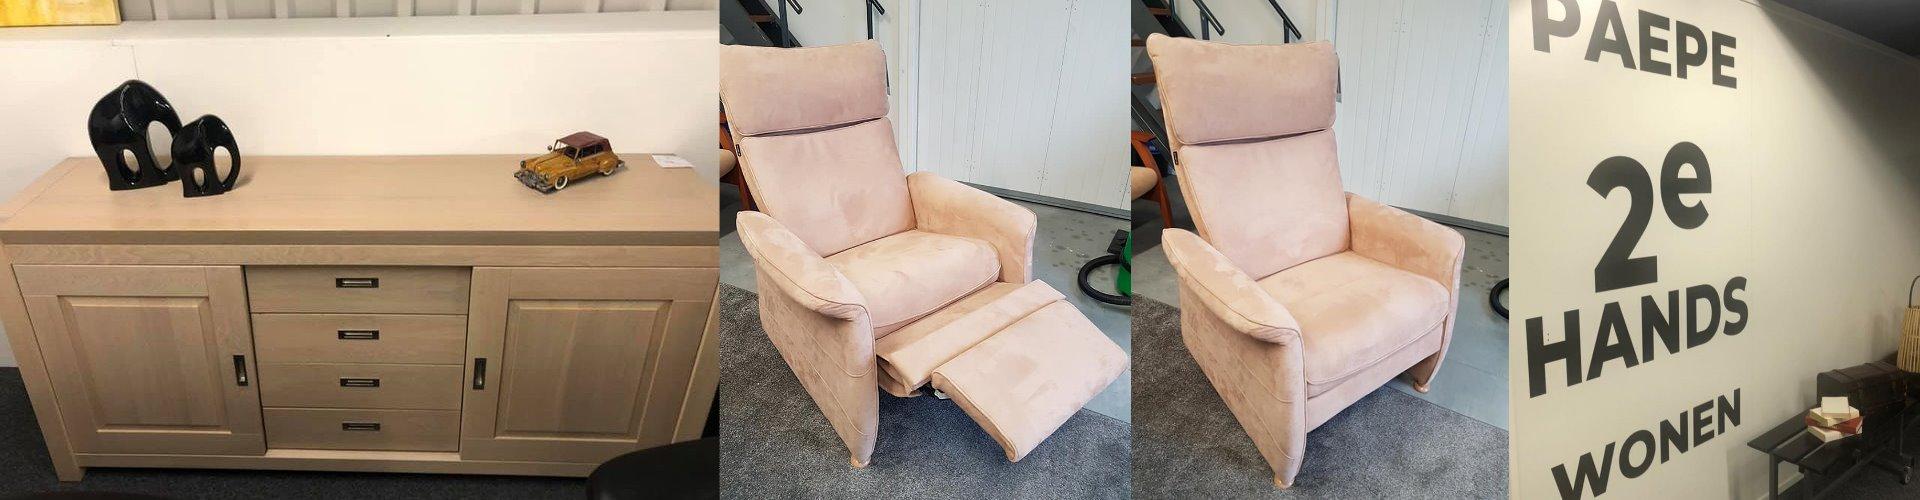 paepes-2ehands-meubelen